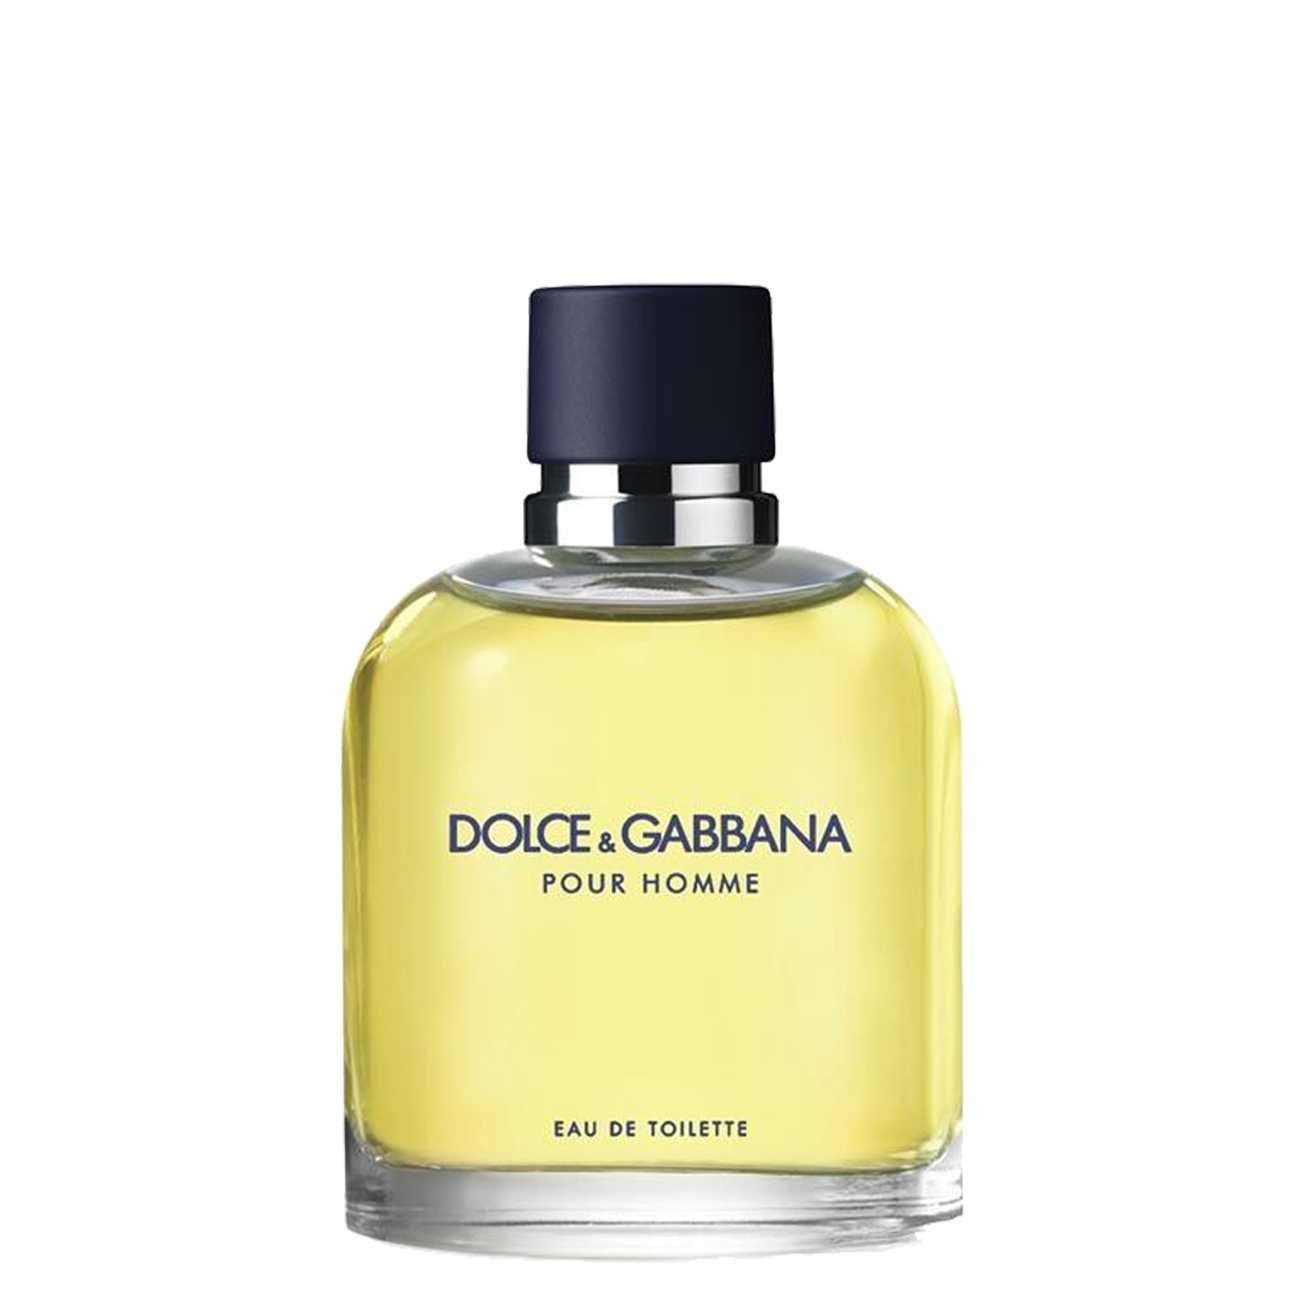 Pour Homme 75ml Dolce & Gabbana imagine 2021 bestvalue.eu